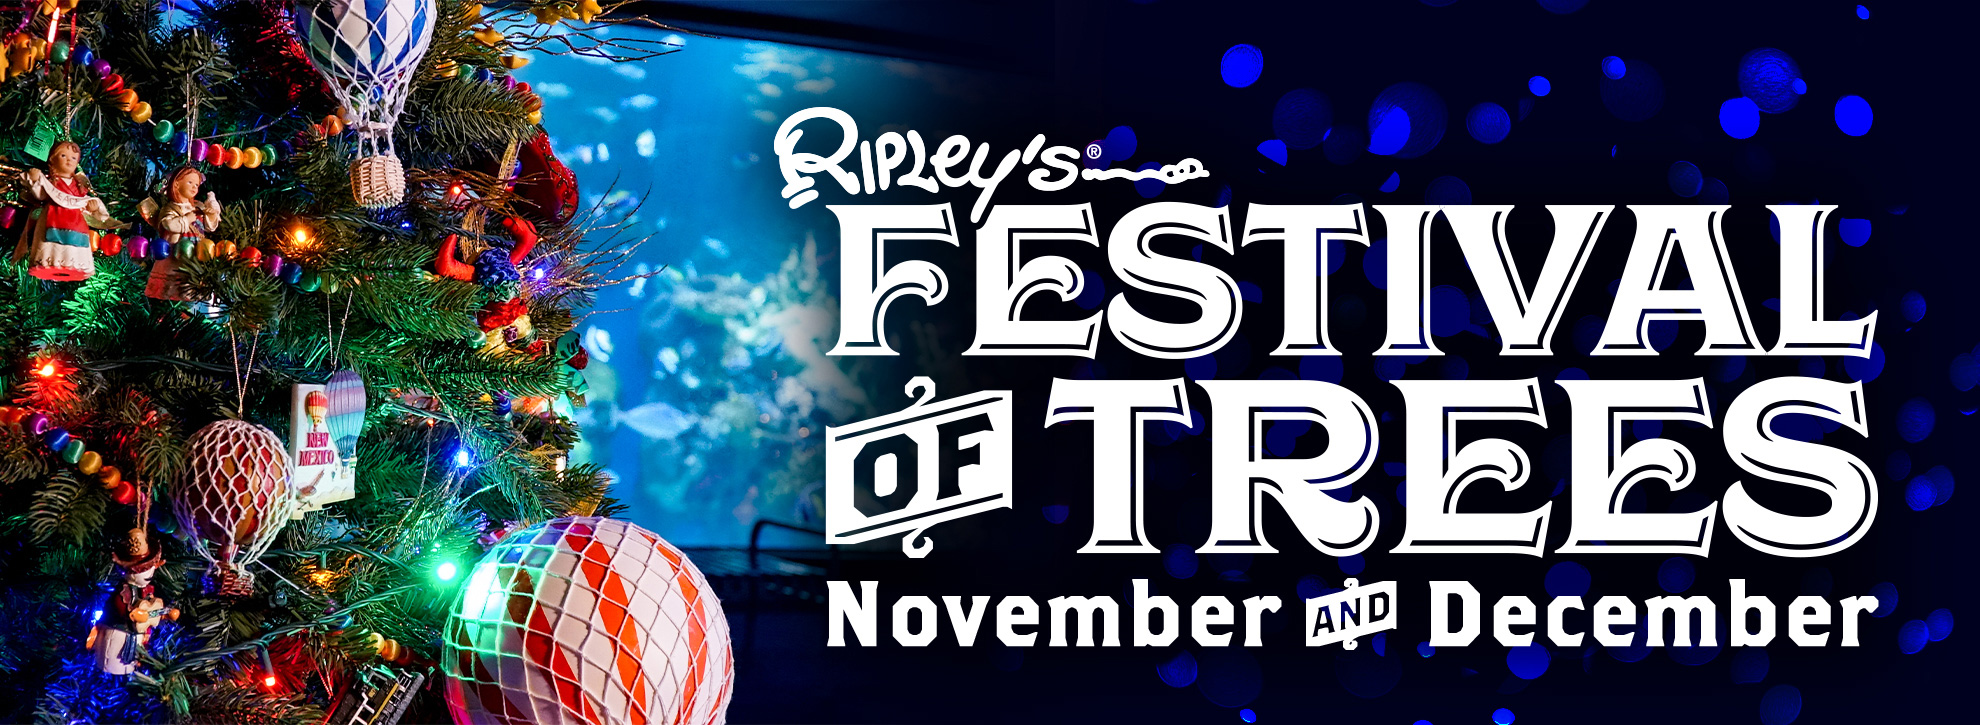 Ripley's Aquarium of Myrtle Beach Festival of Trees